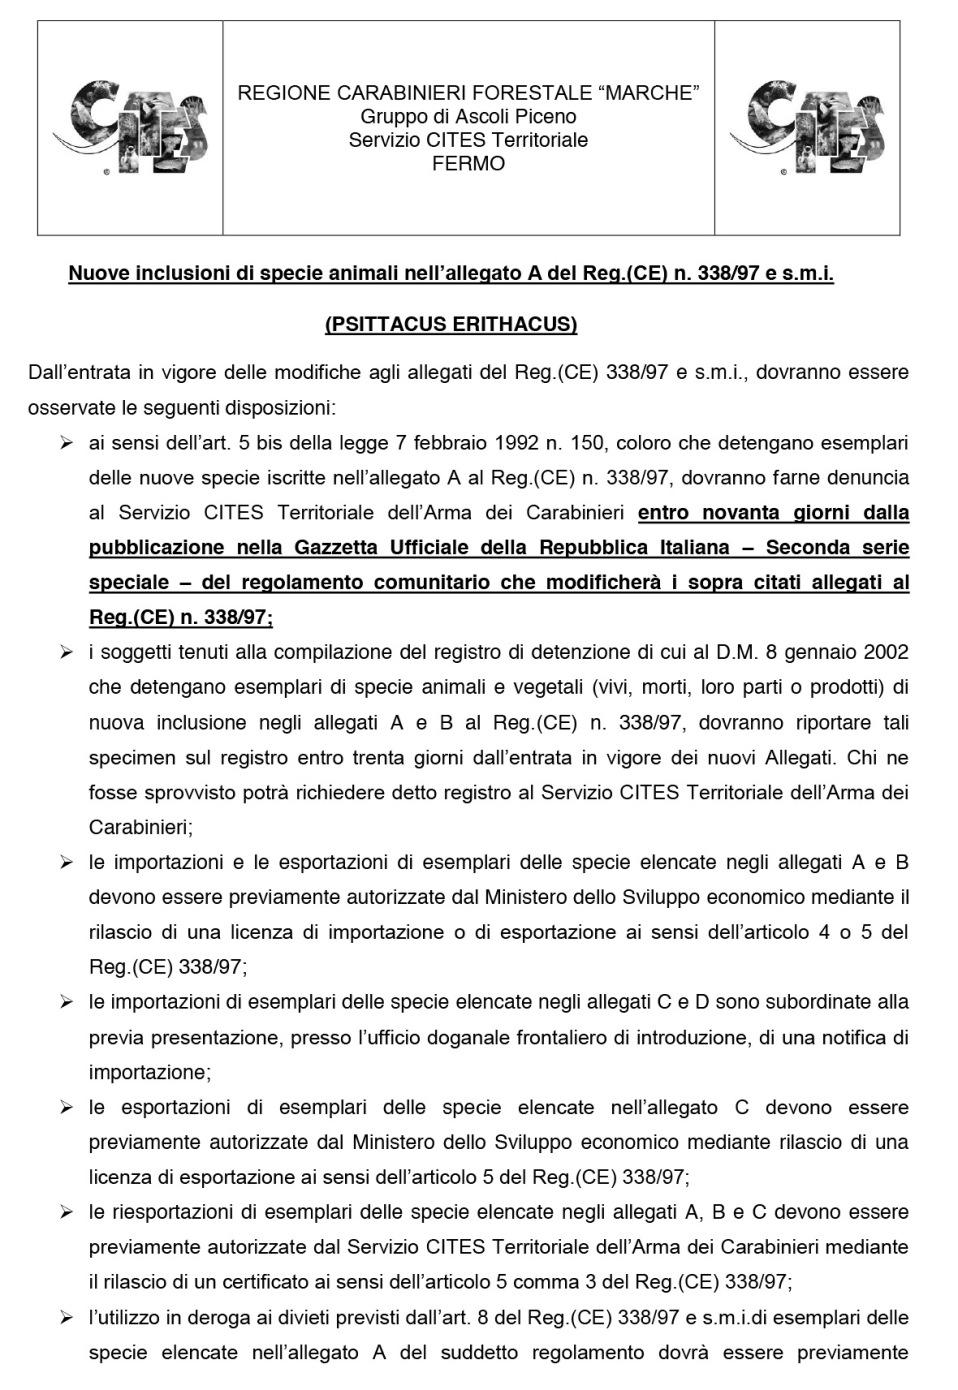 CERTIFI1.PDF